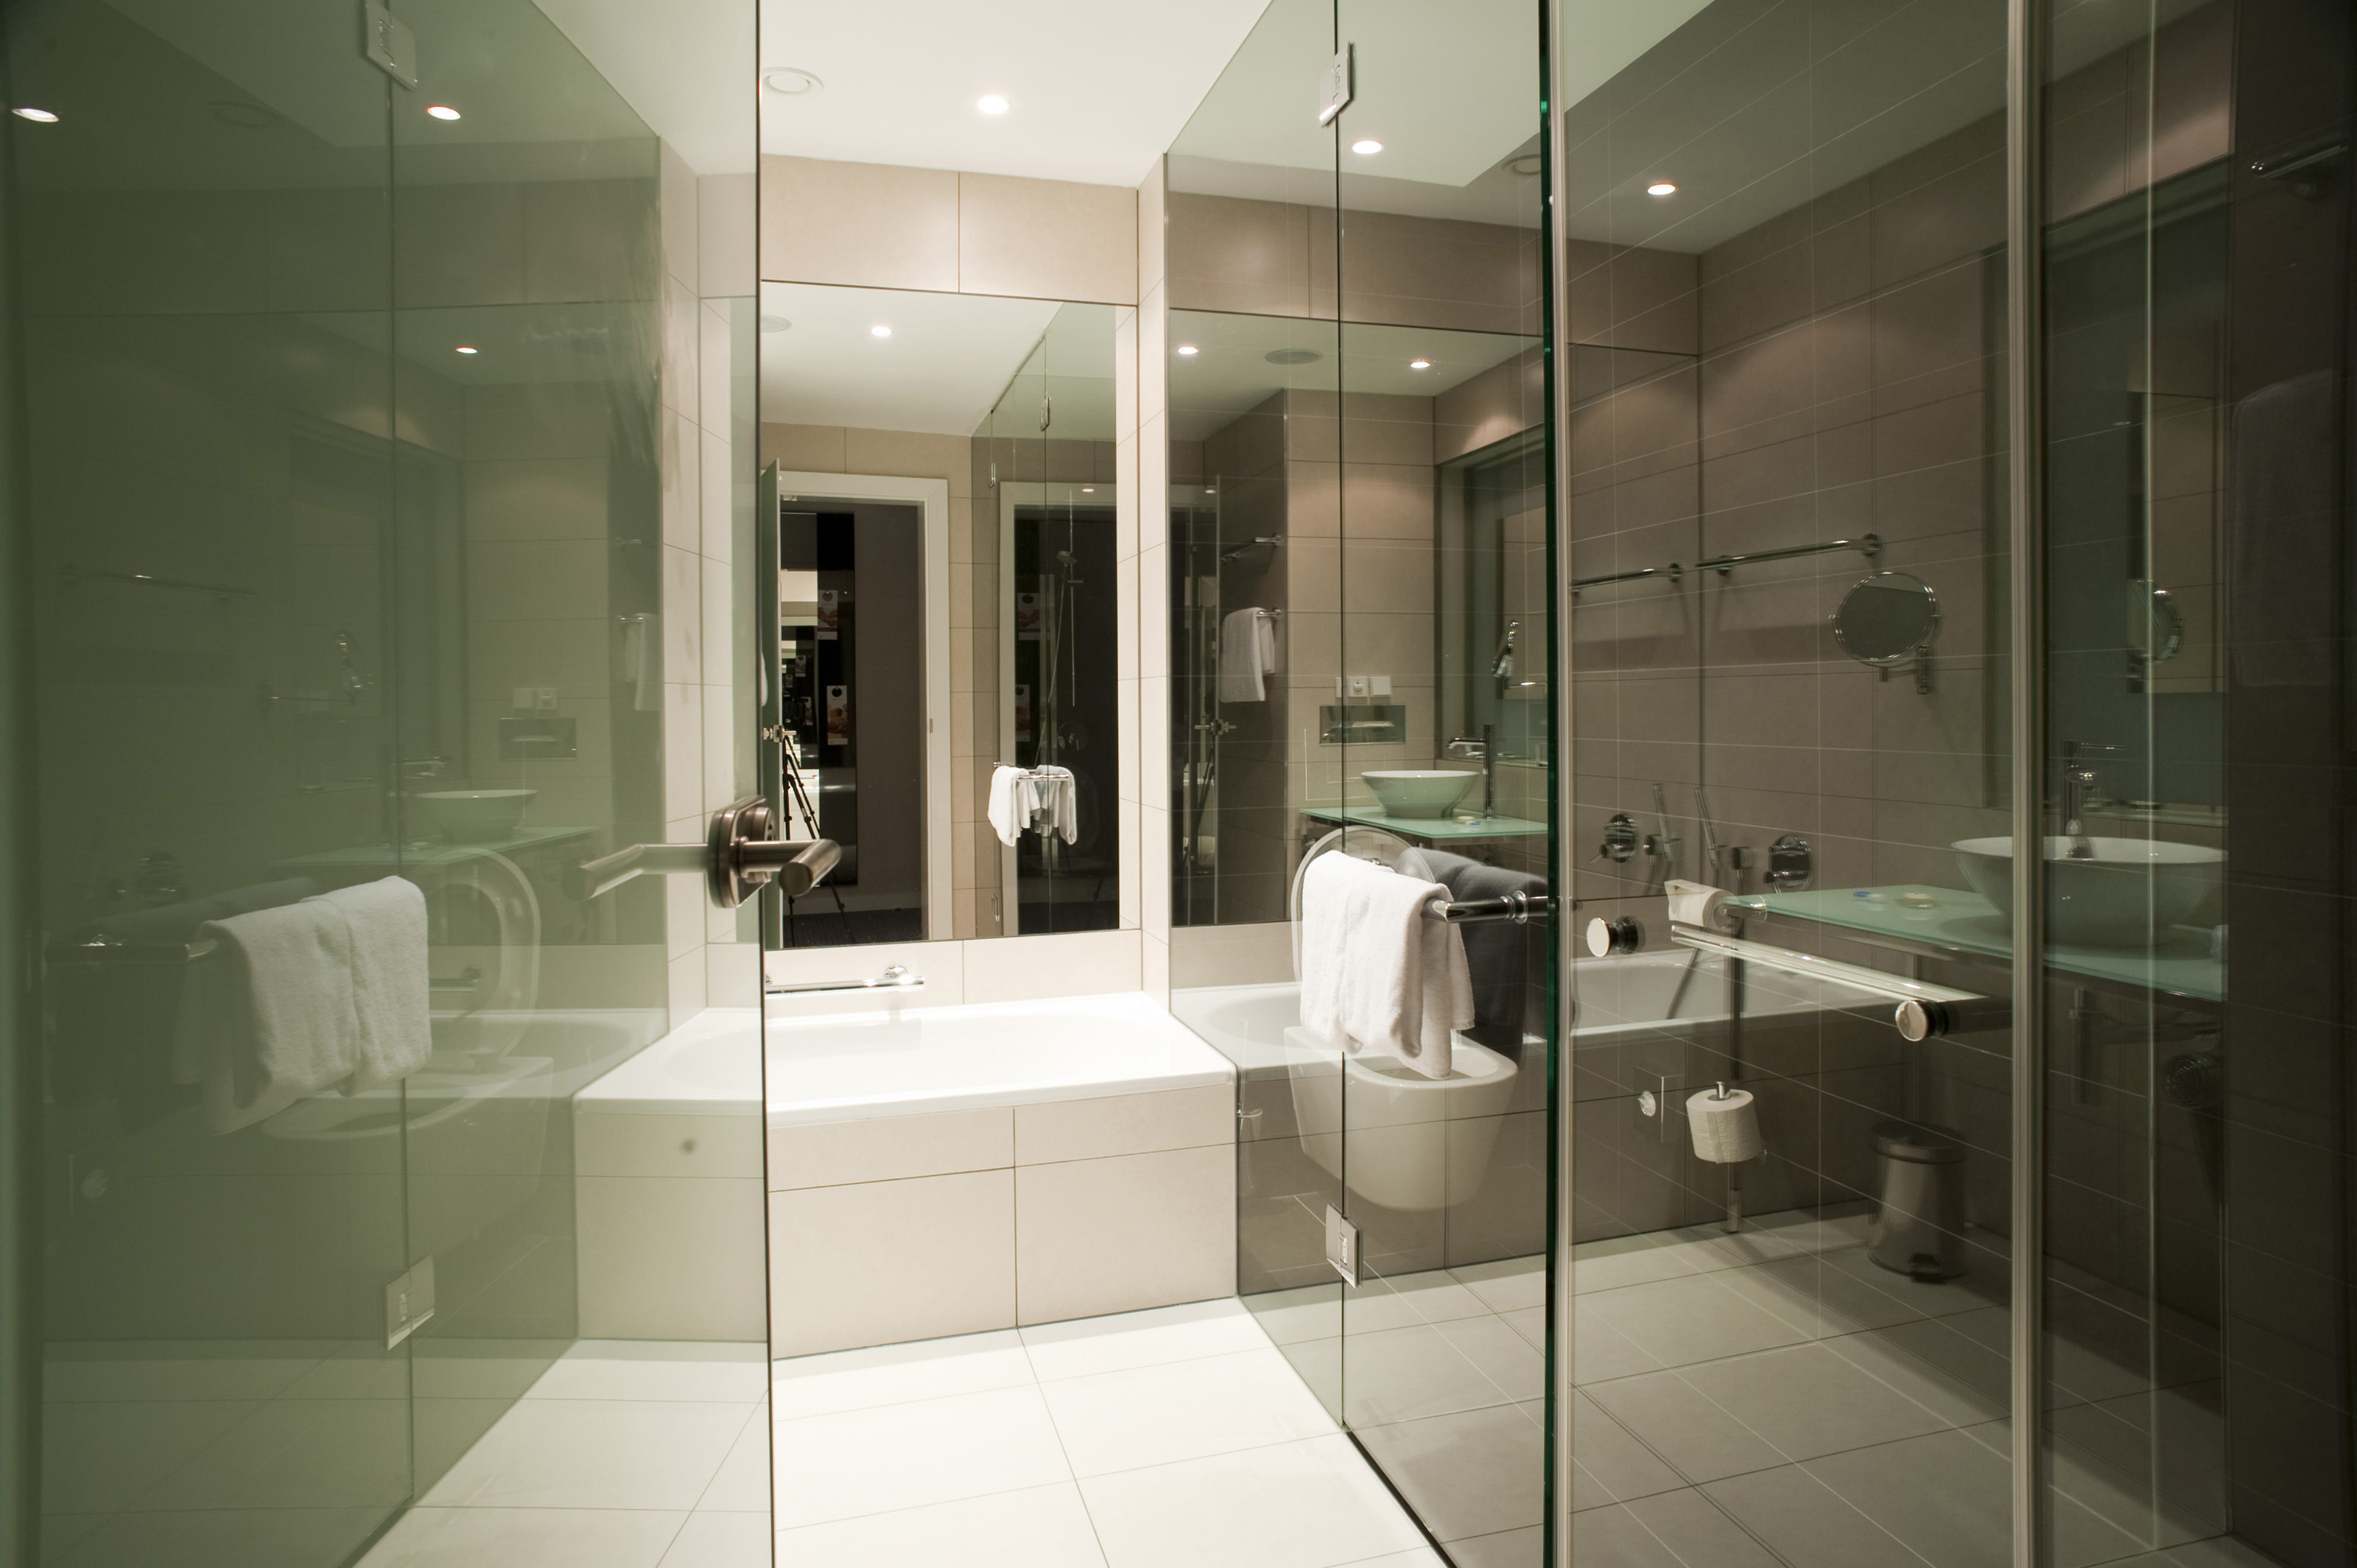 Bathroom Design Photo Gallery Ideas ~ Free stock photo modern bathroom freeimageslive